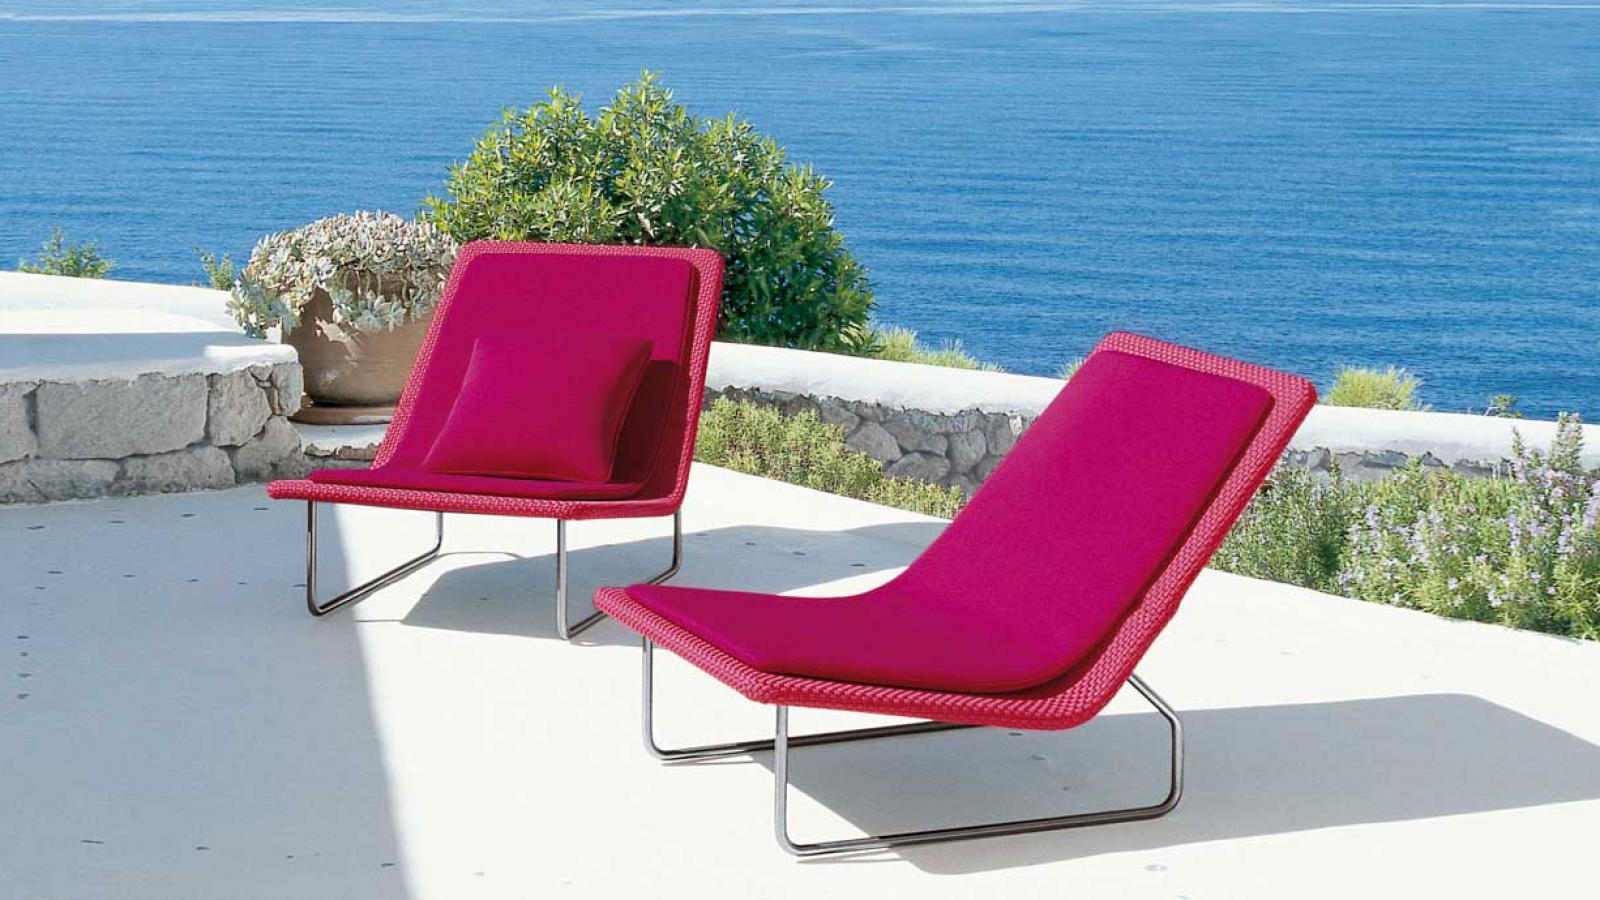 Feelathome stockverkoop paola lenti sand easy chair for Paola lenti